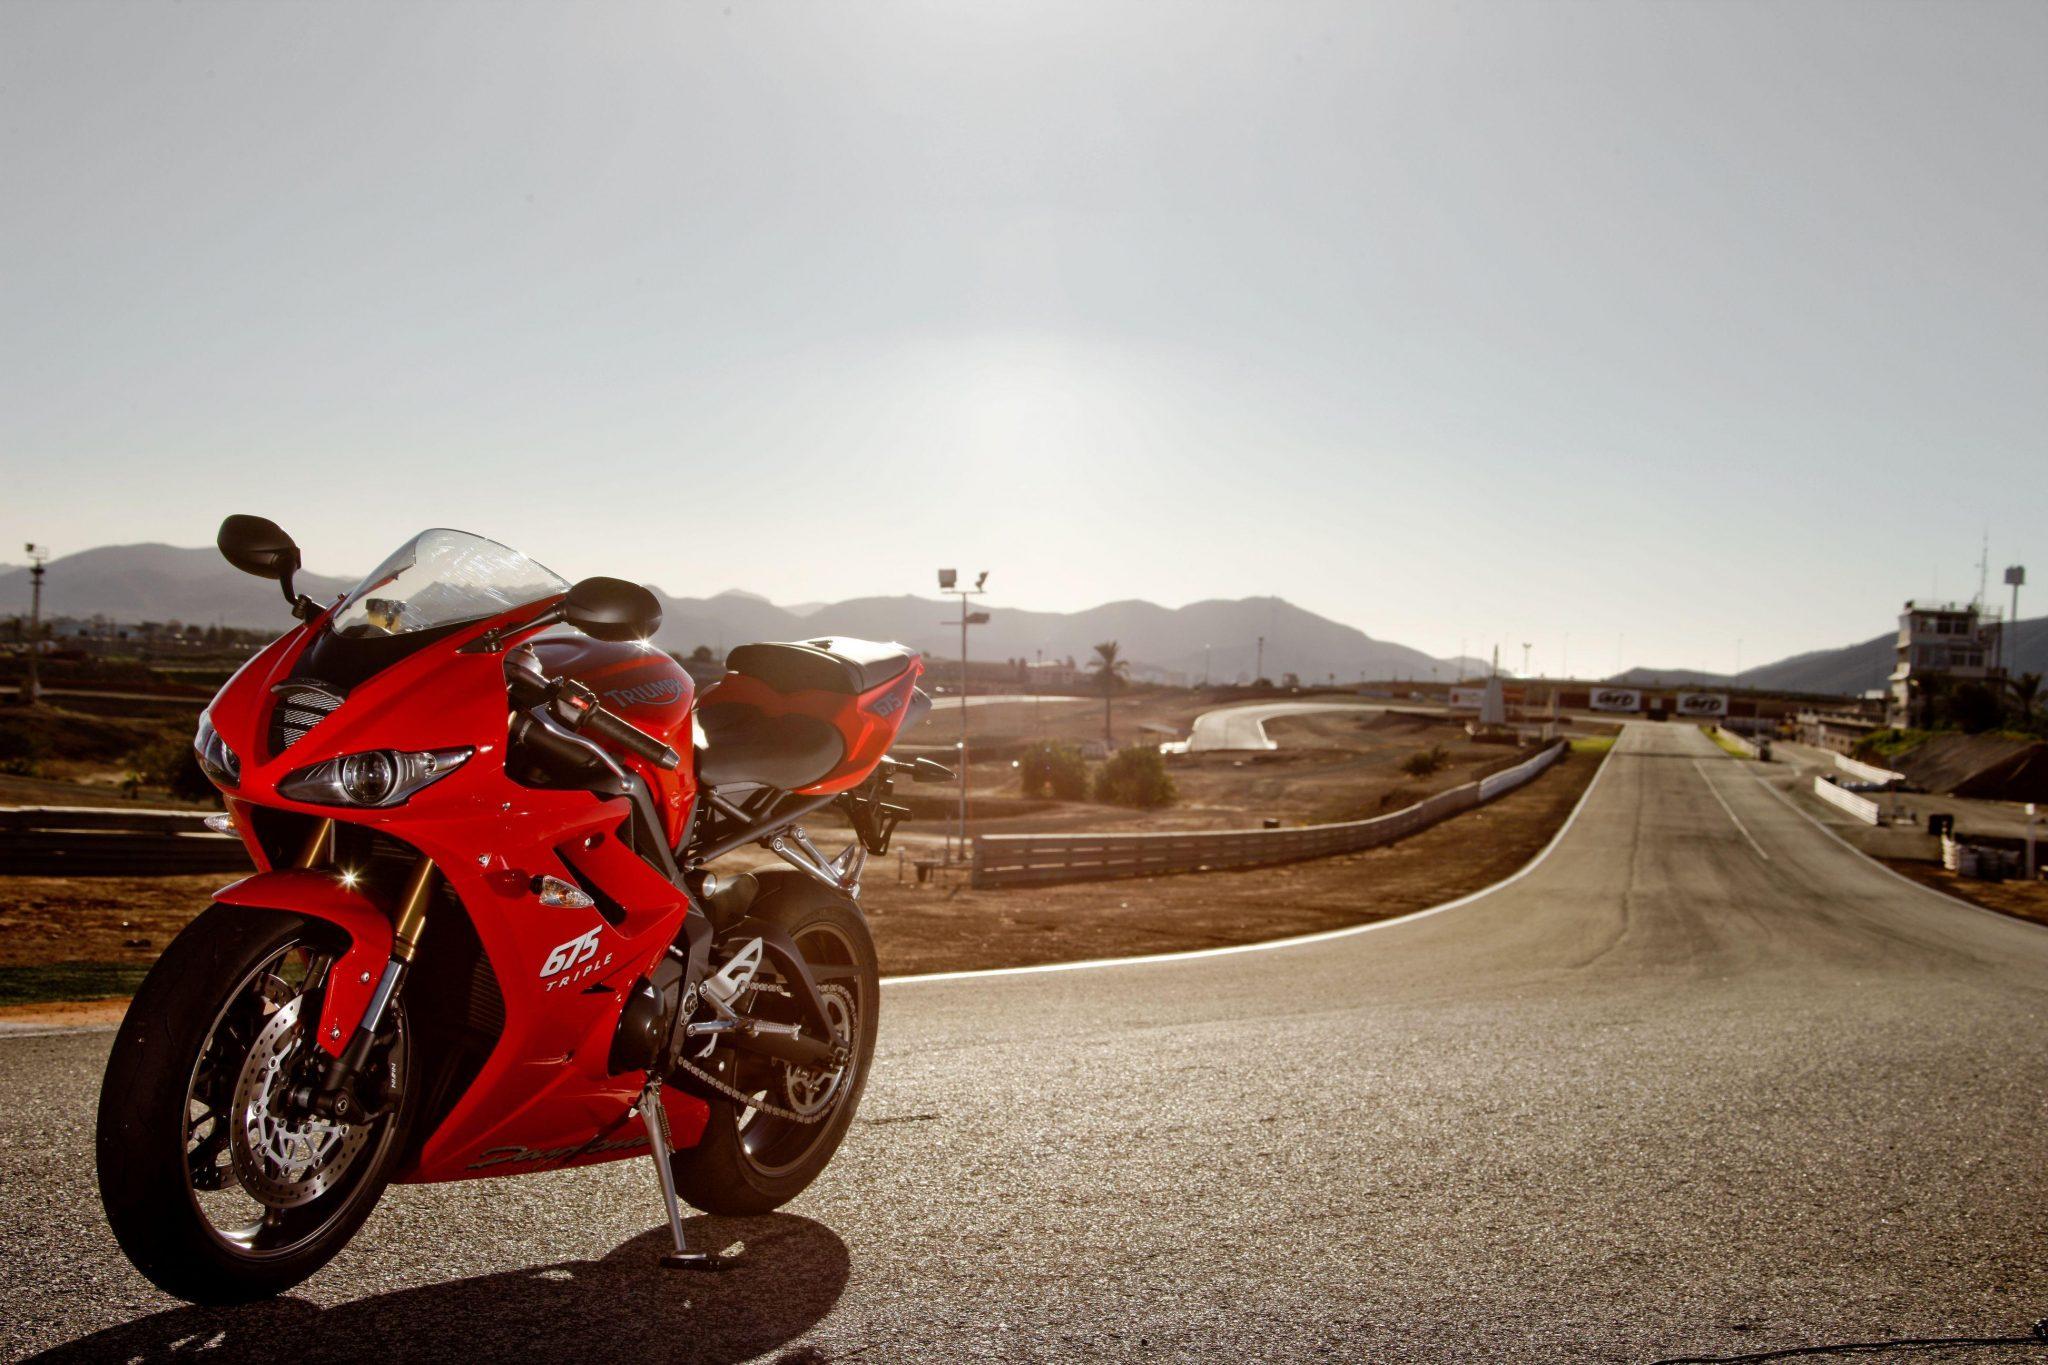 ukmoto import moto moto occasion moto anglaise moto angleterre 22 - RESERVER UNE INSPECTION MOTO PAR VOTRE MANDATAIRE MOTO UKMOTO